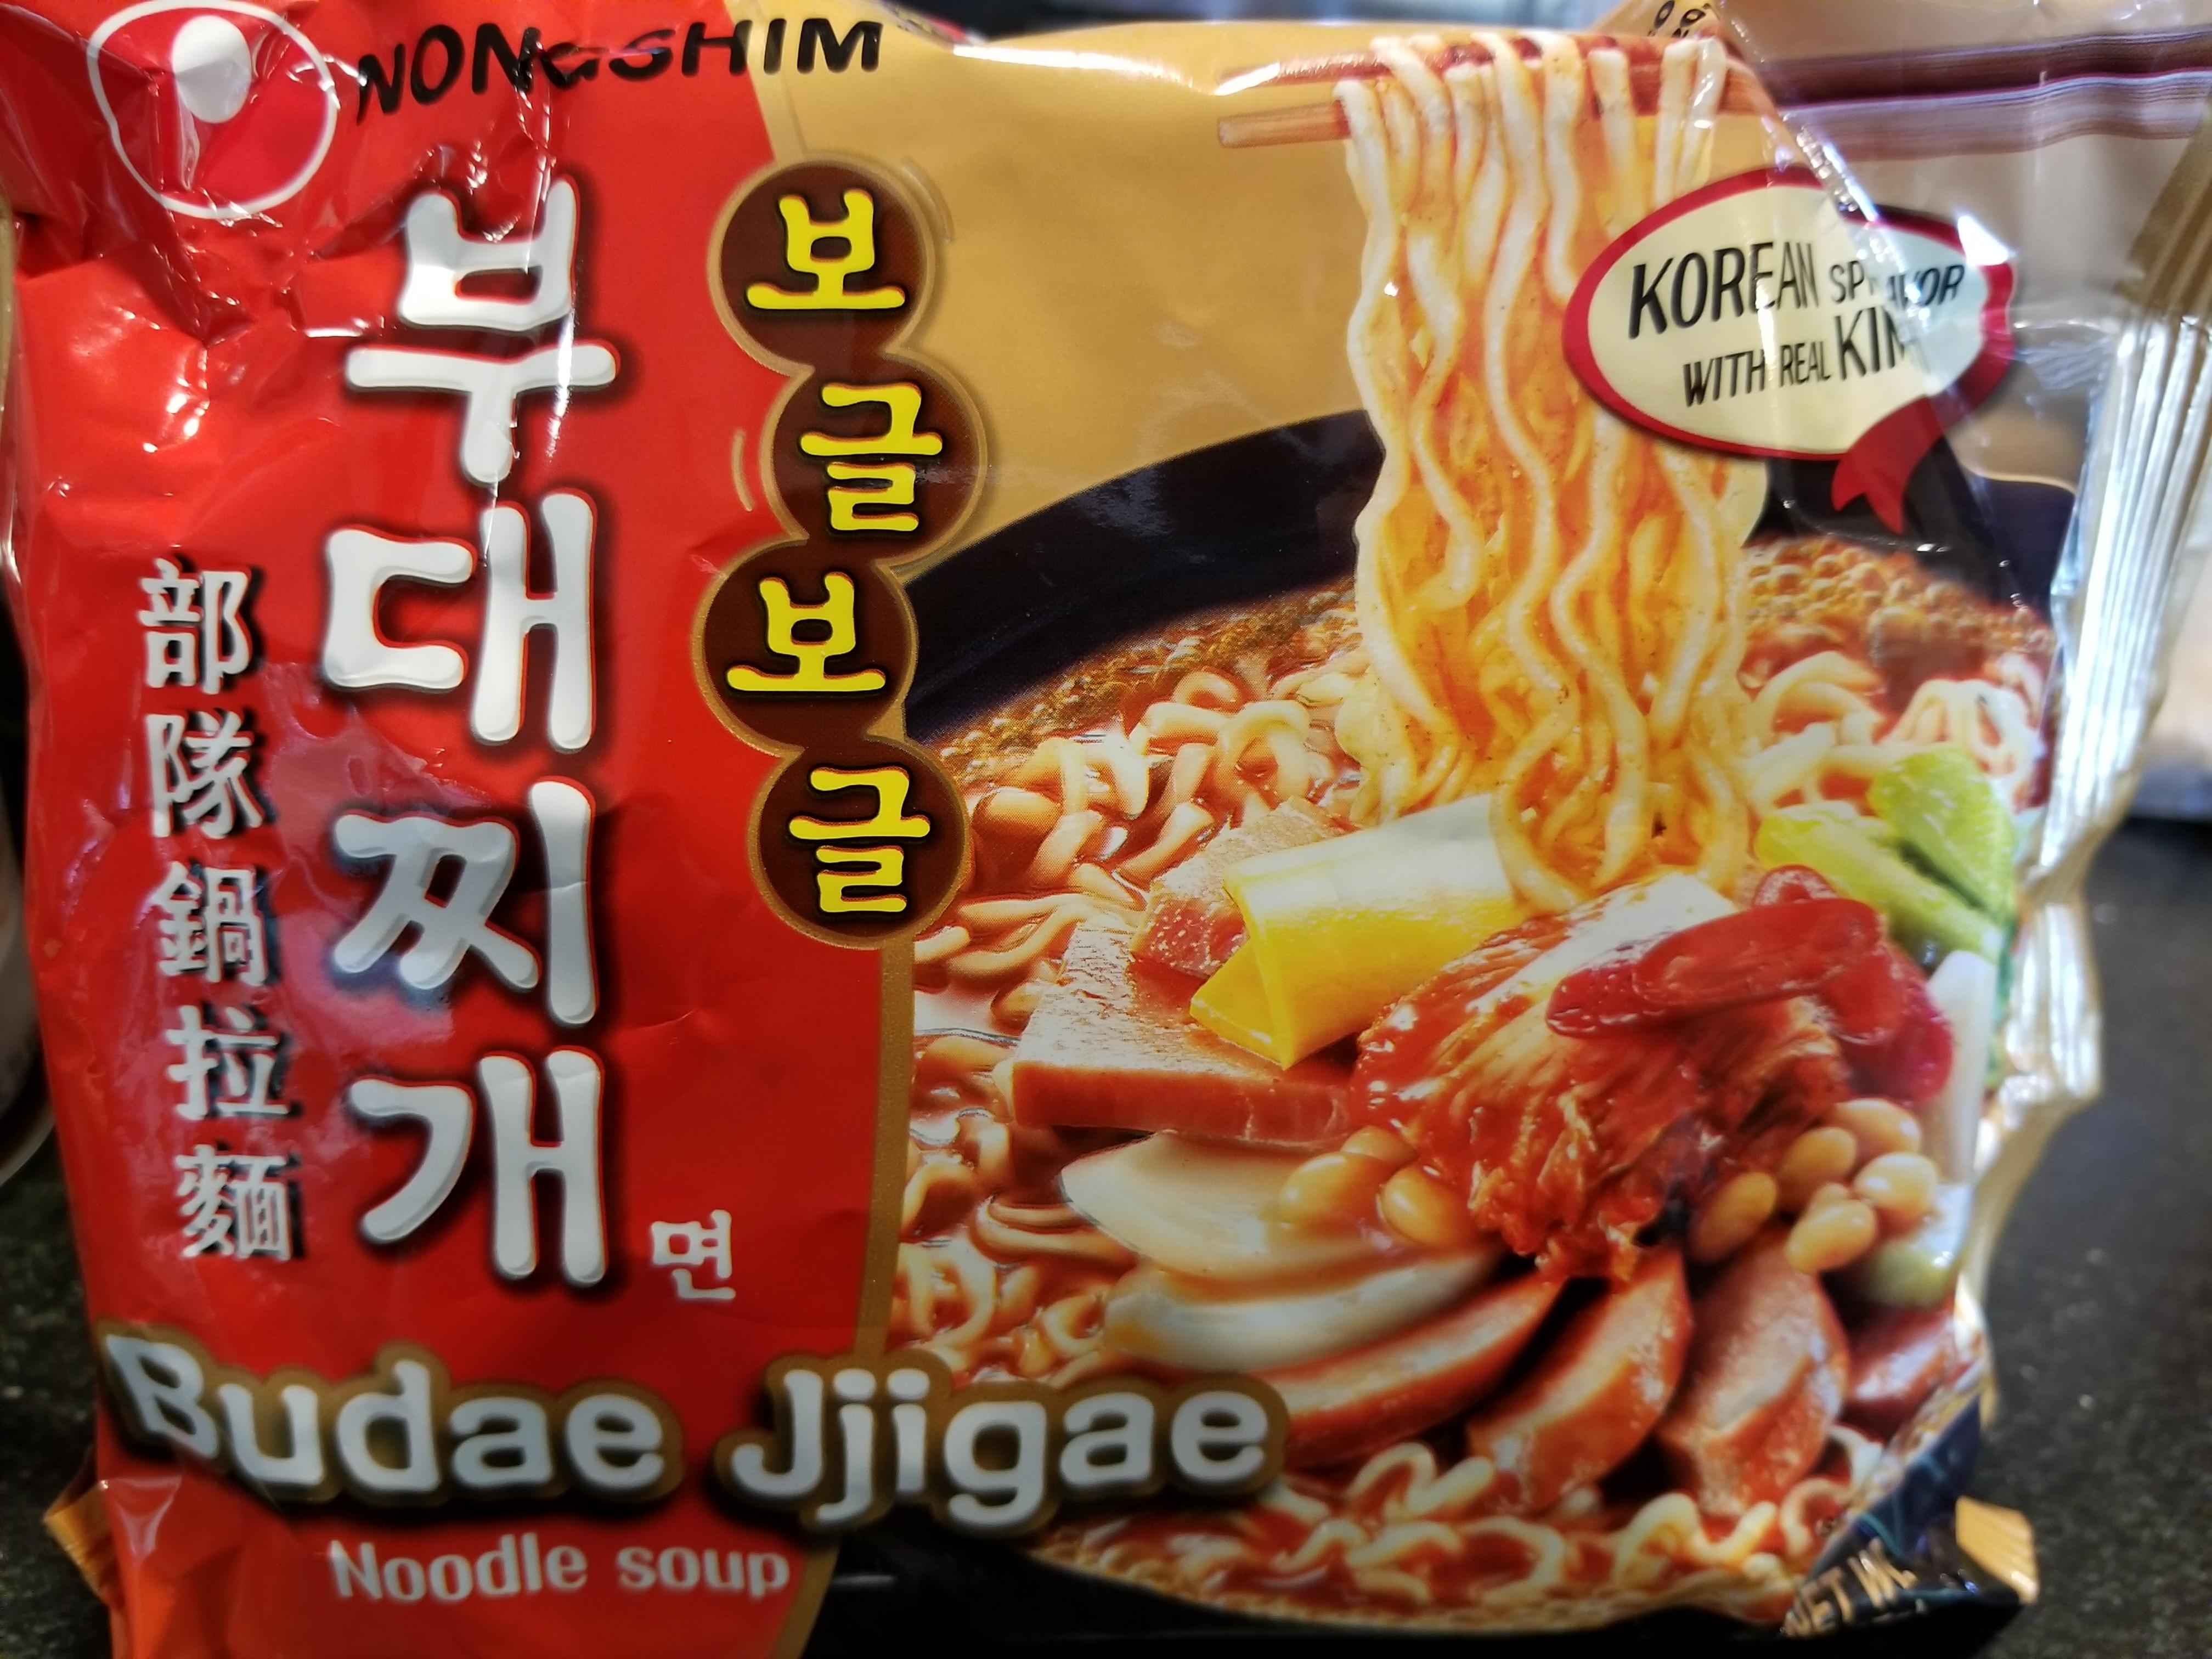 Nongshim Budae Jjigae Instant Noodles